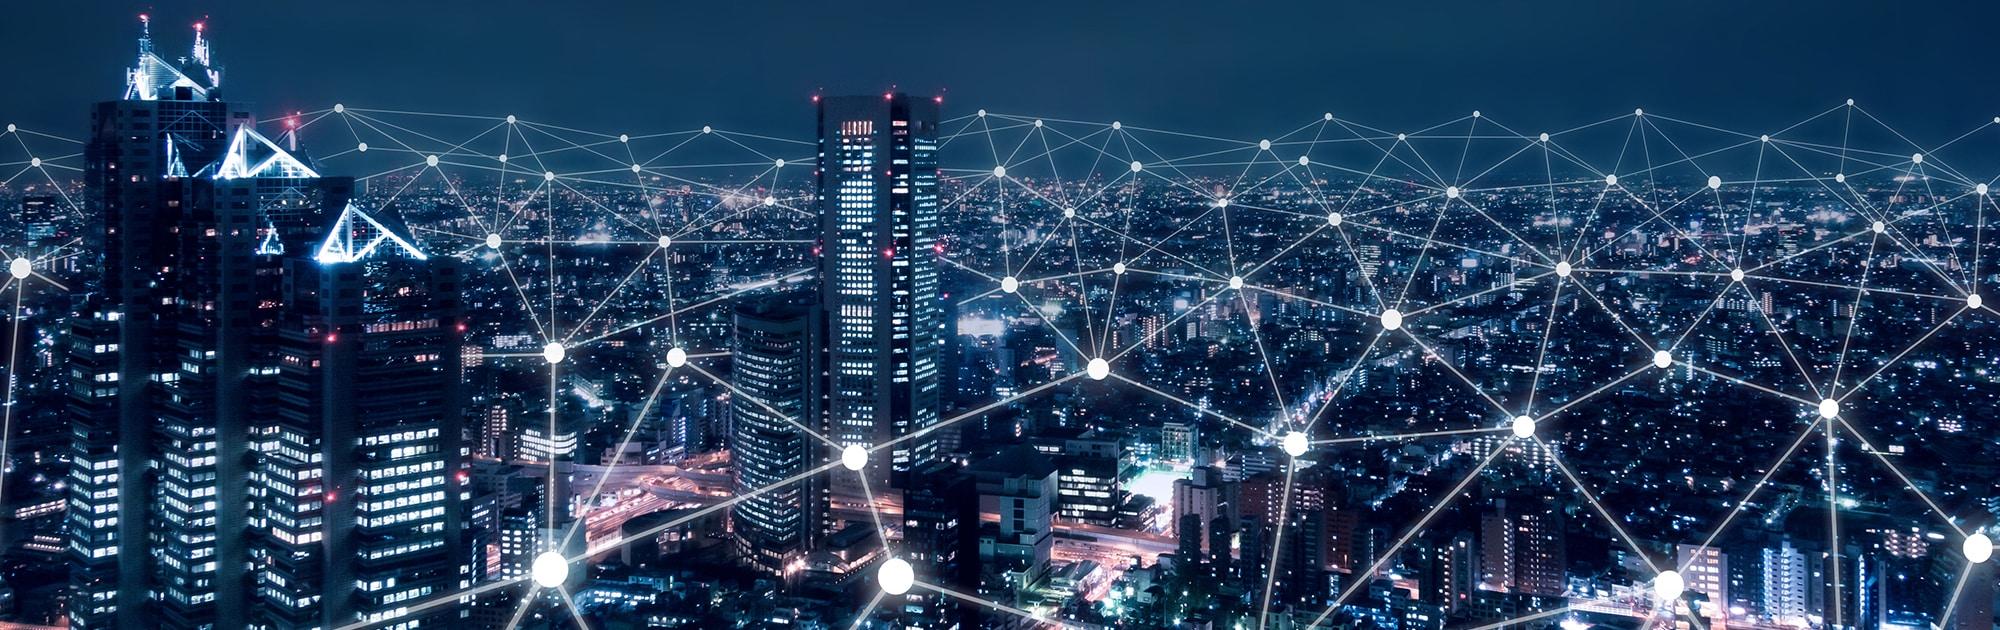 Digitised cityscape at night